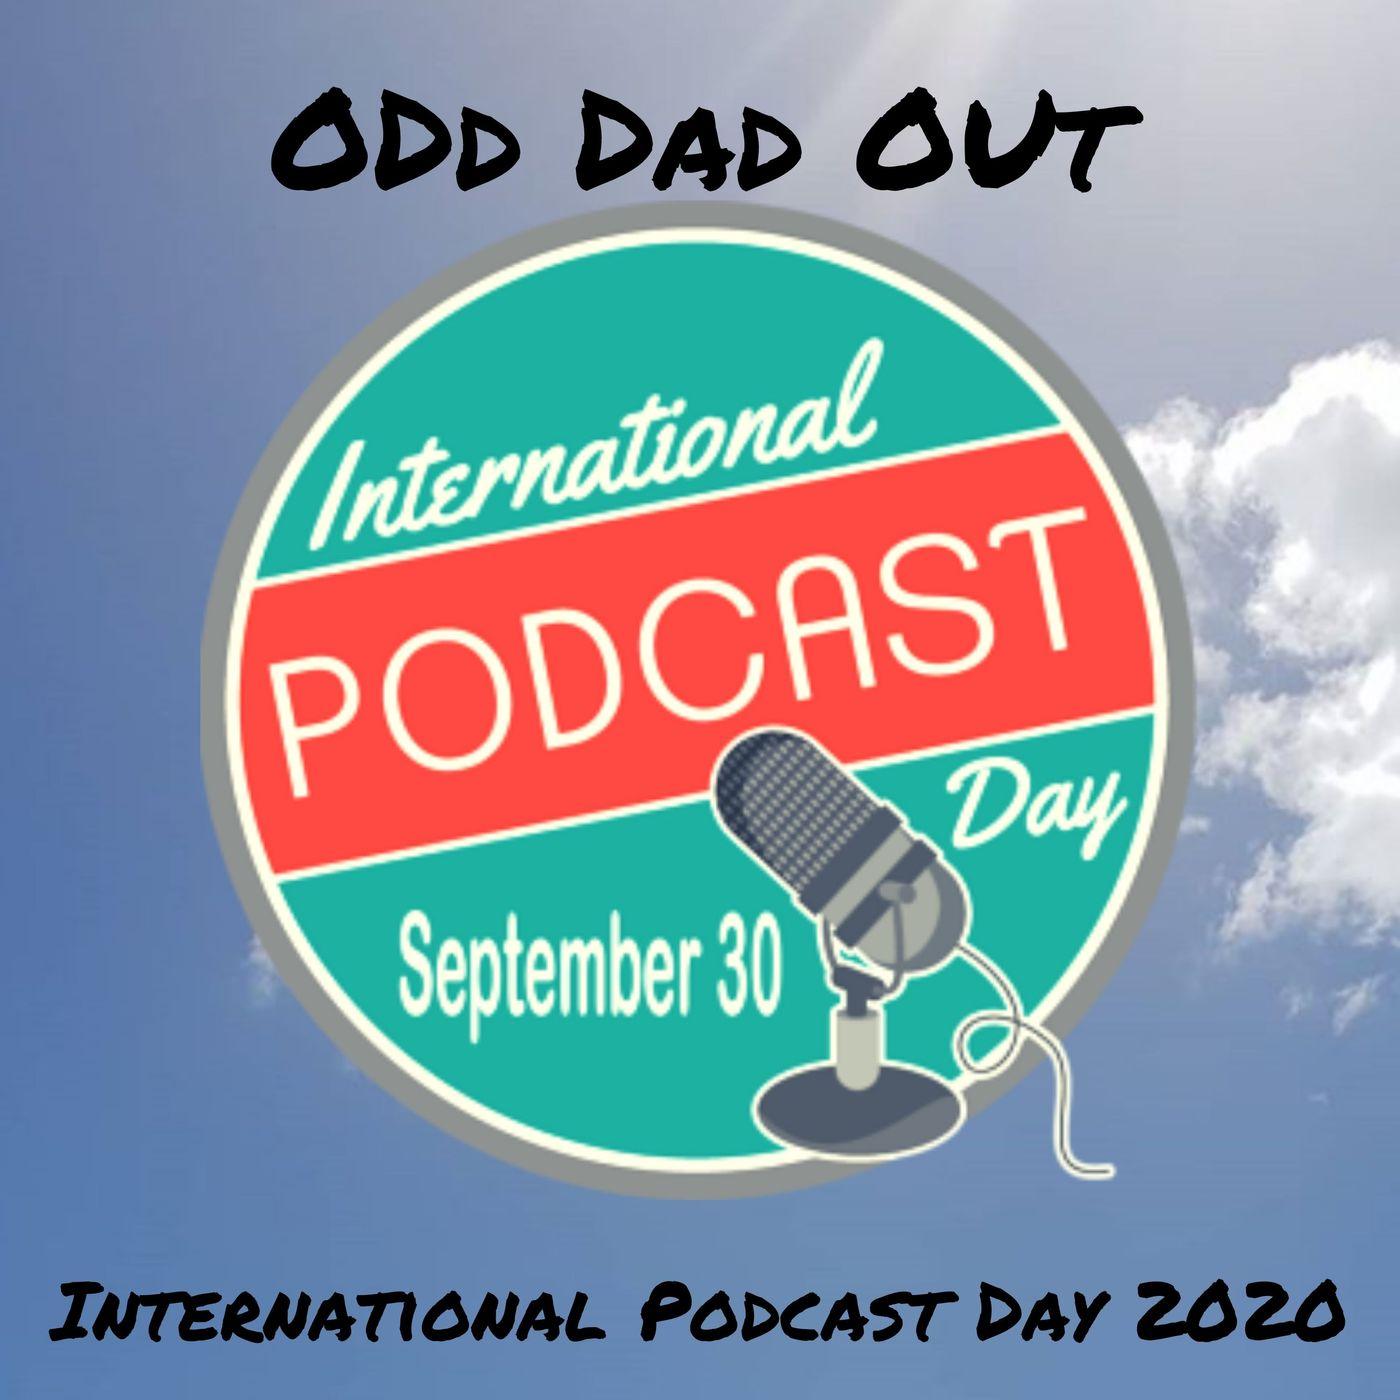 Bonus: International Podcast Day 2020